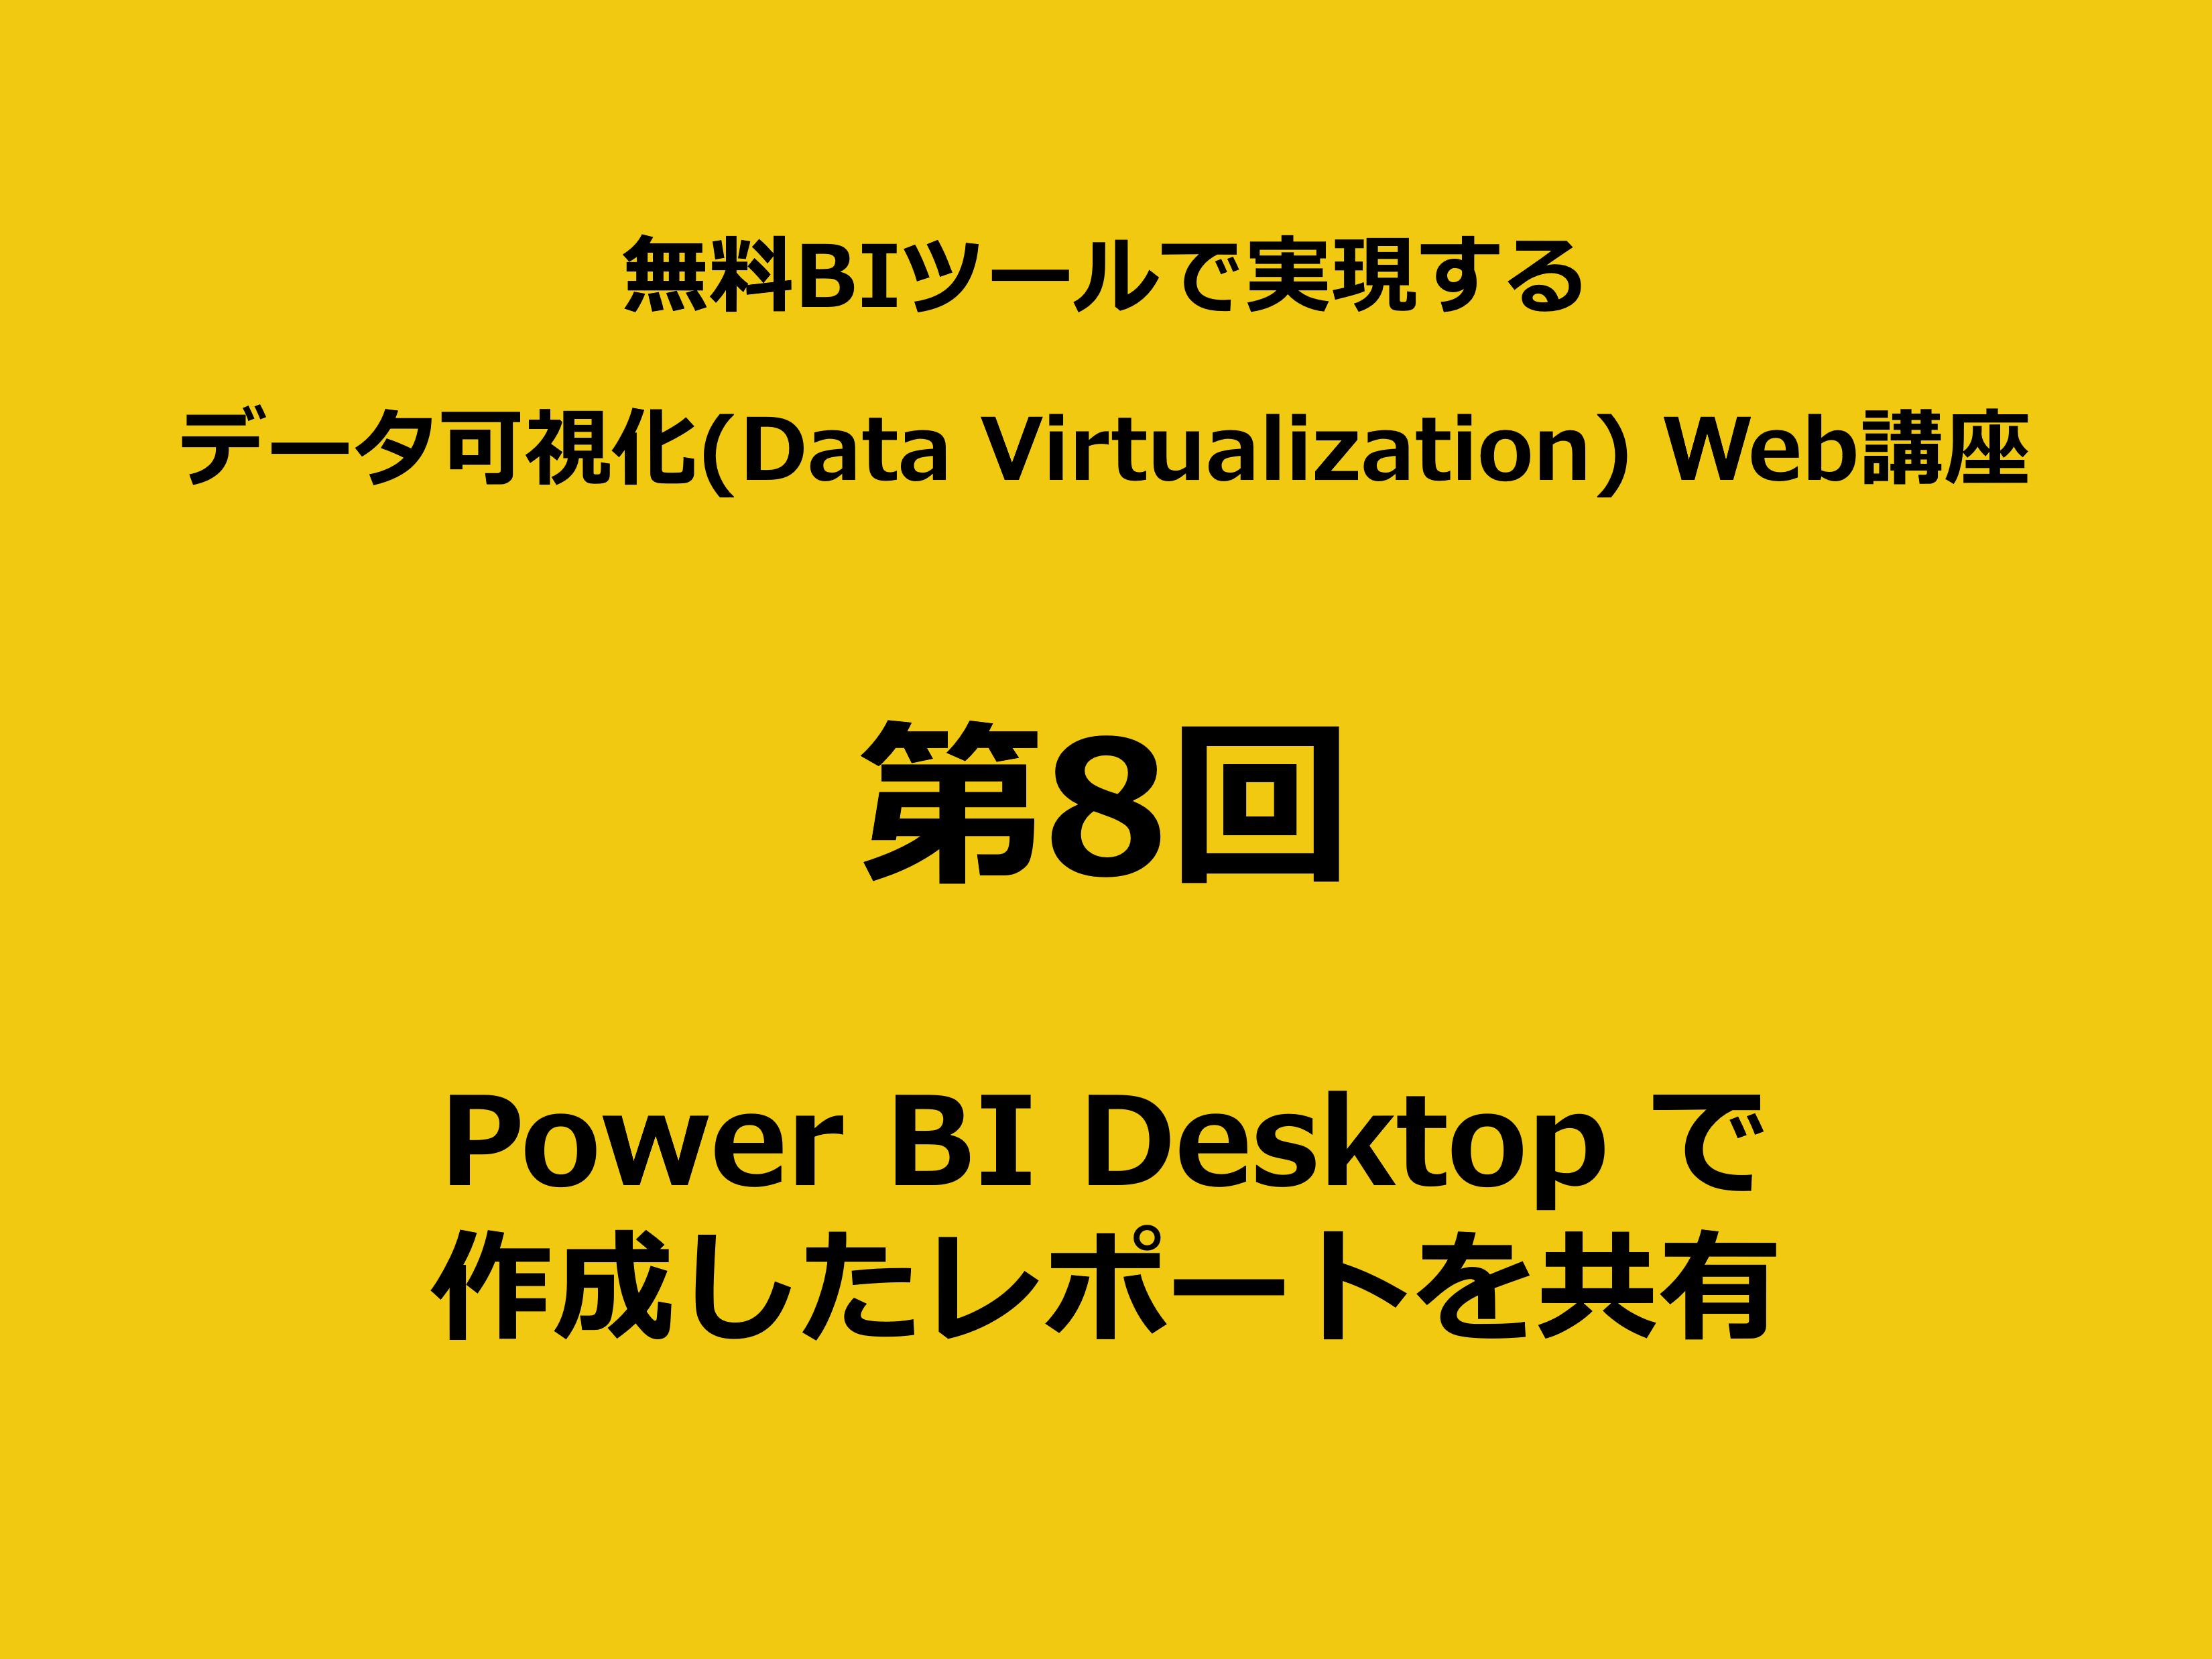 Power BI Desktop で作成したレポートを共有